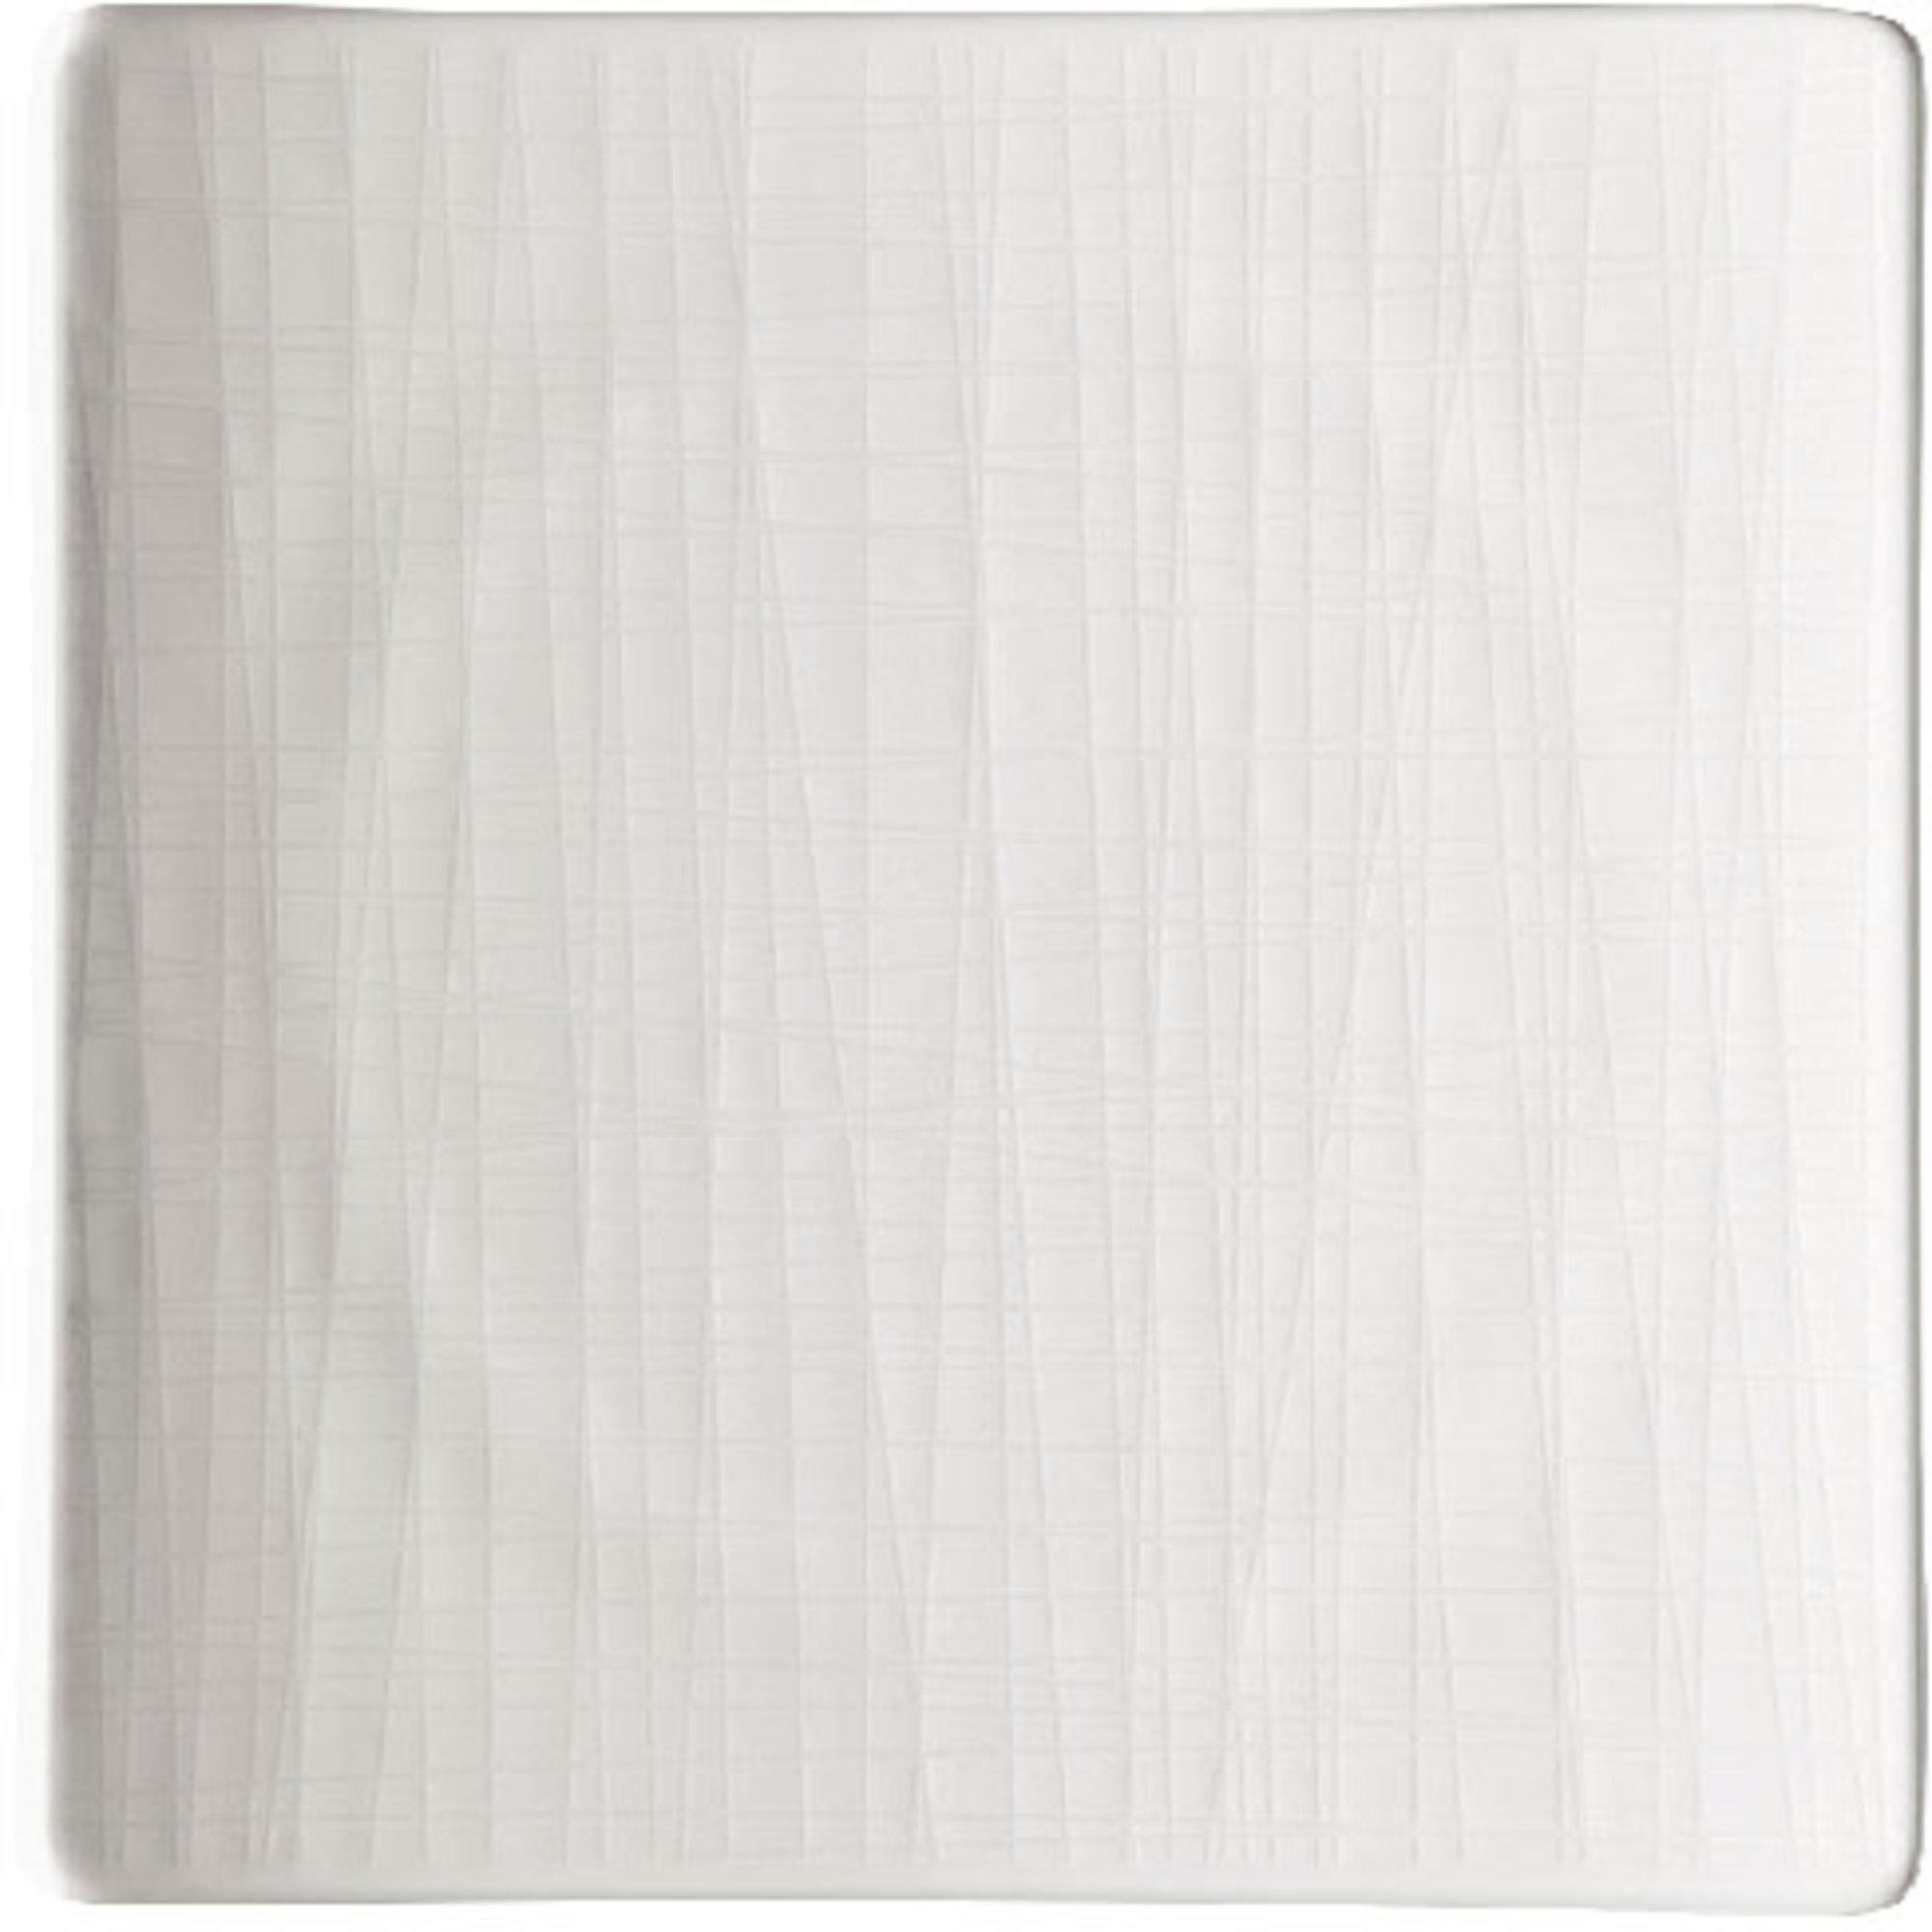 Rosenthal Mesh Relief Tallrik Kvadratisk 17 cm